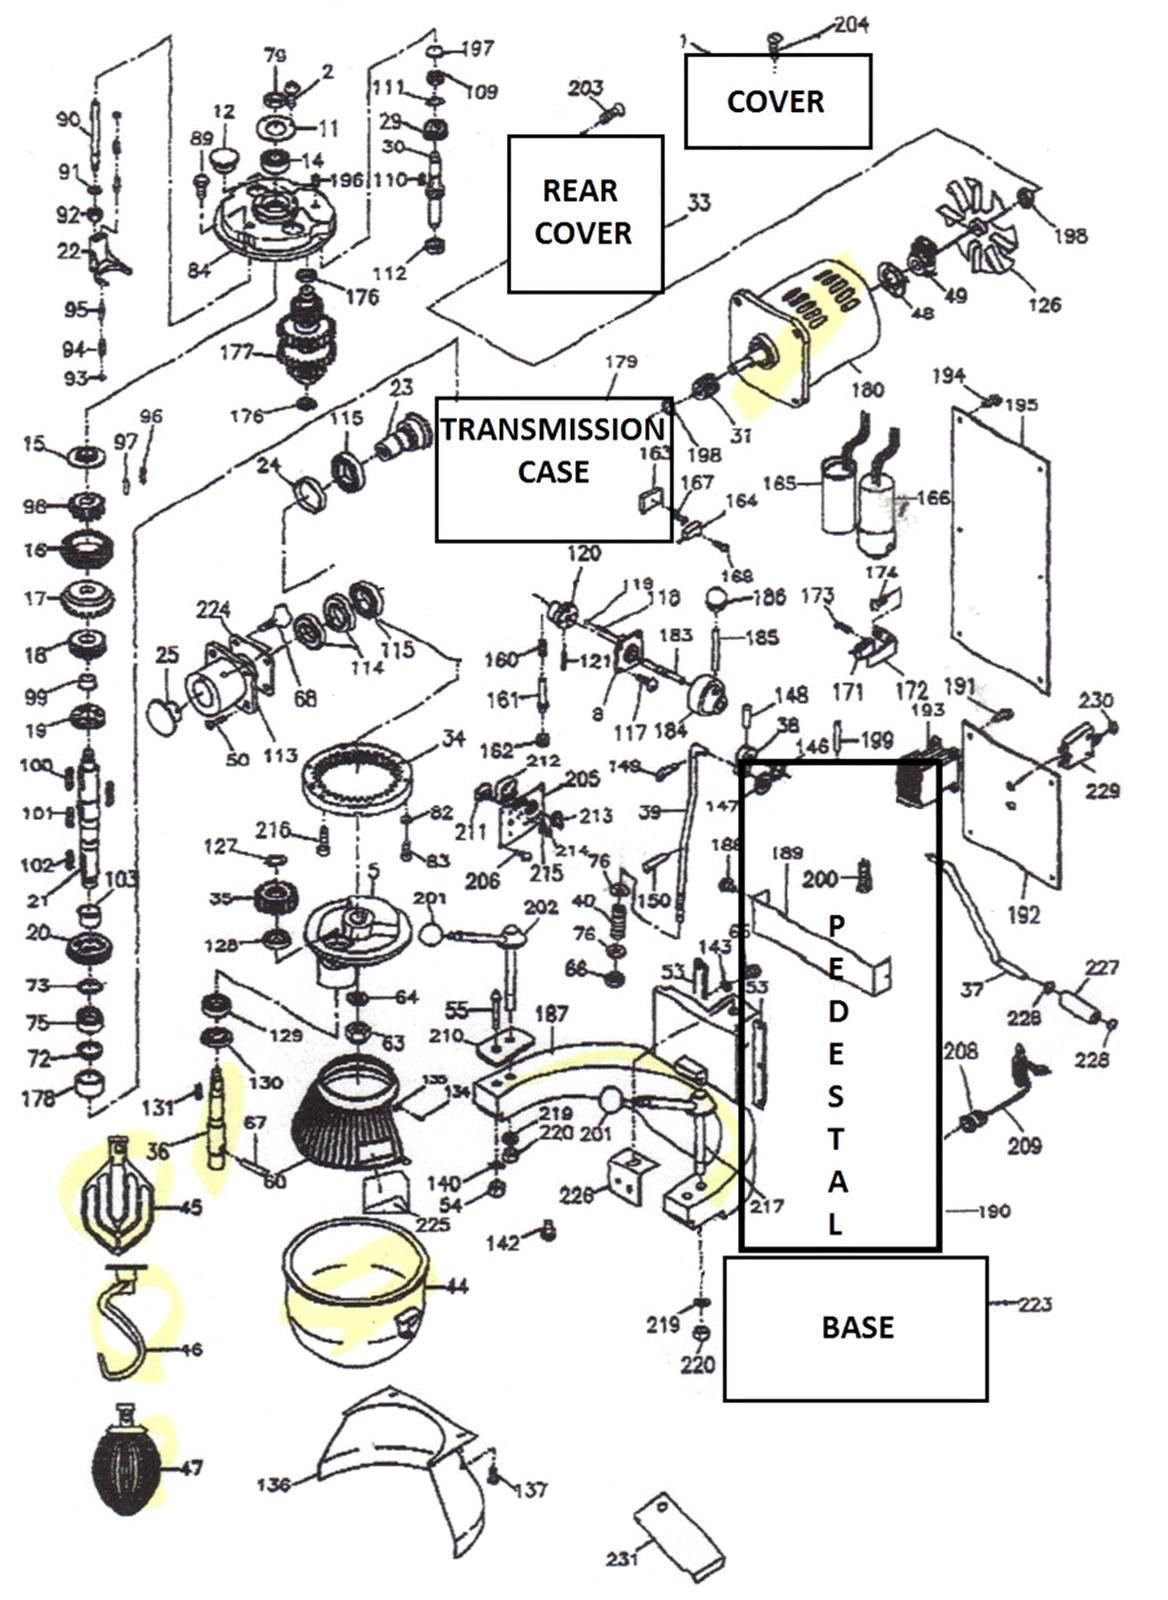 Thunderbird ARM-30 Parts Diagram | Parts TownParts Town